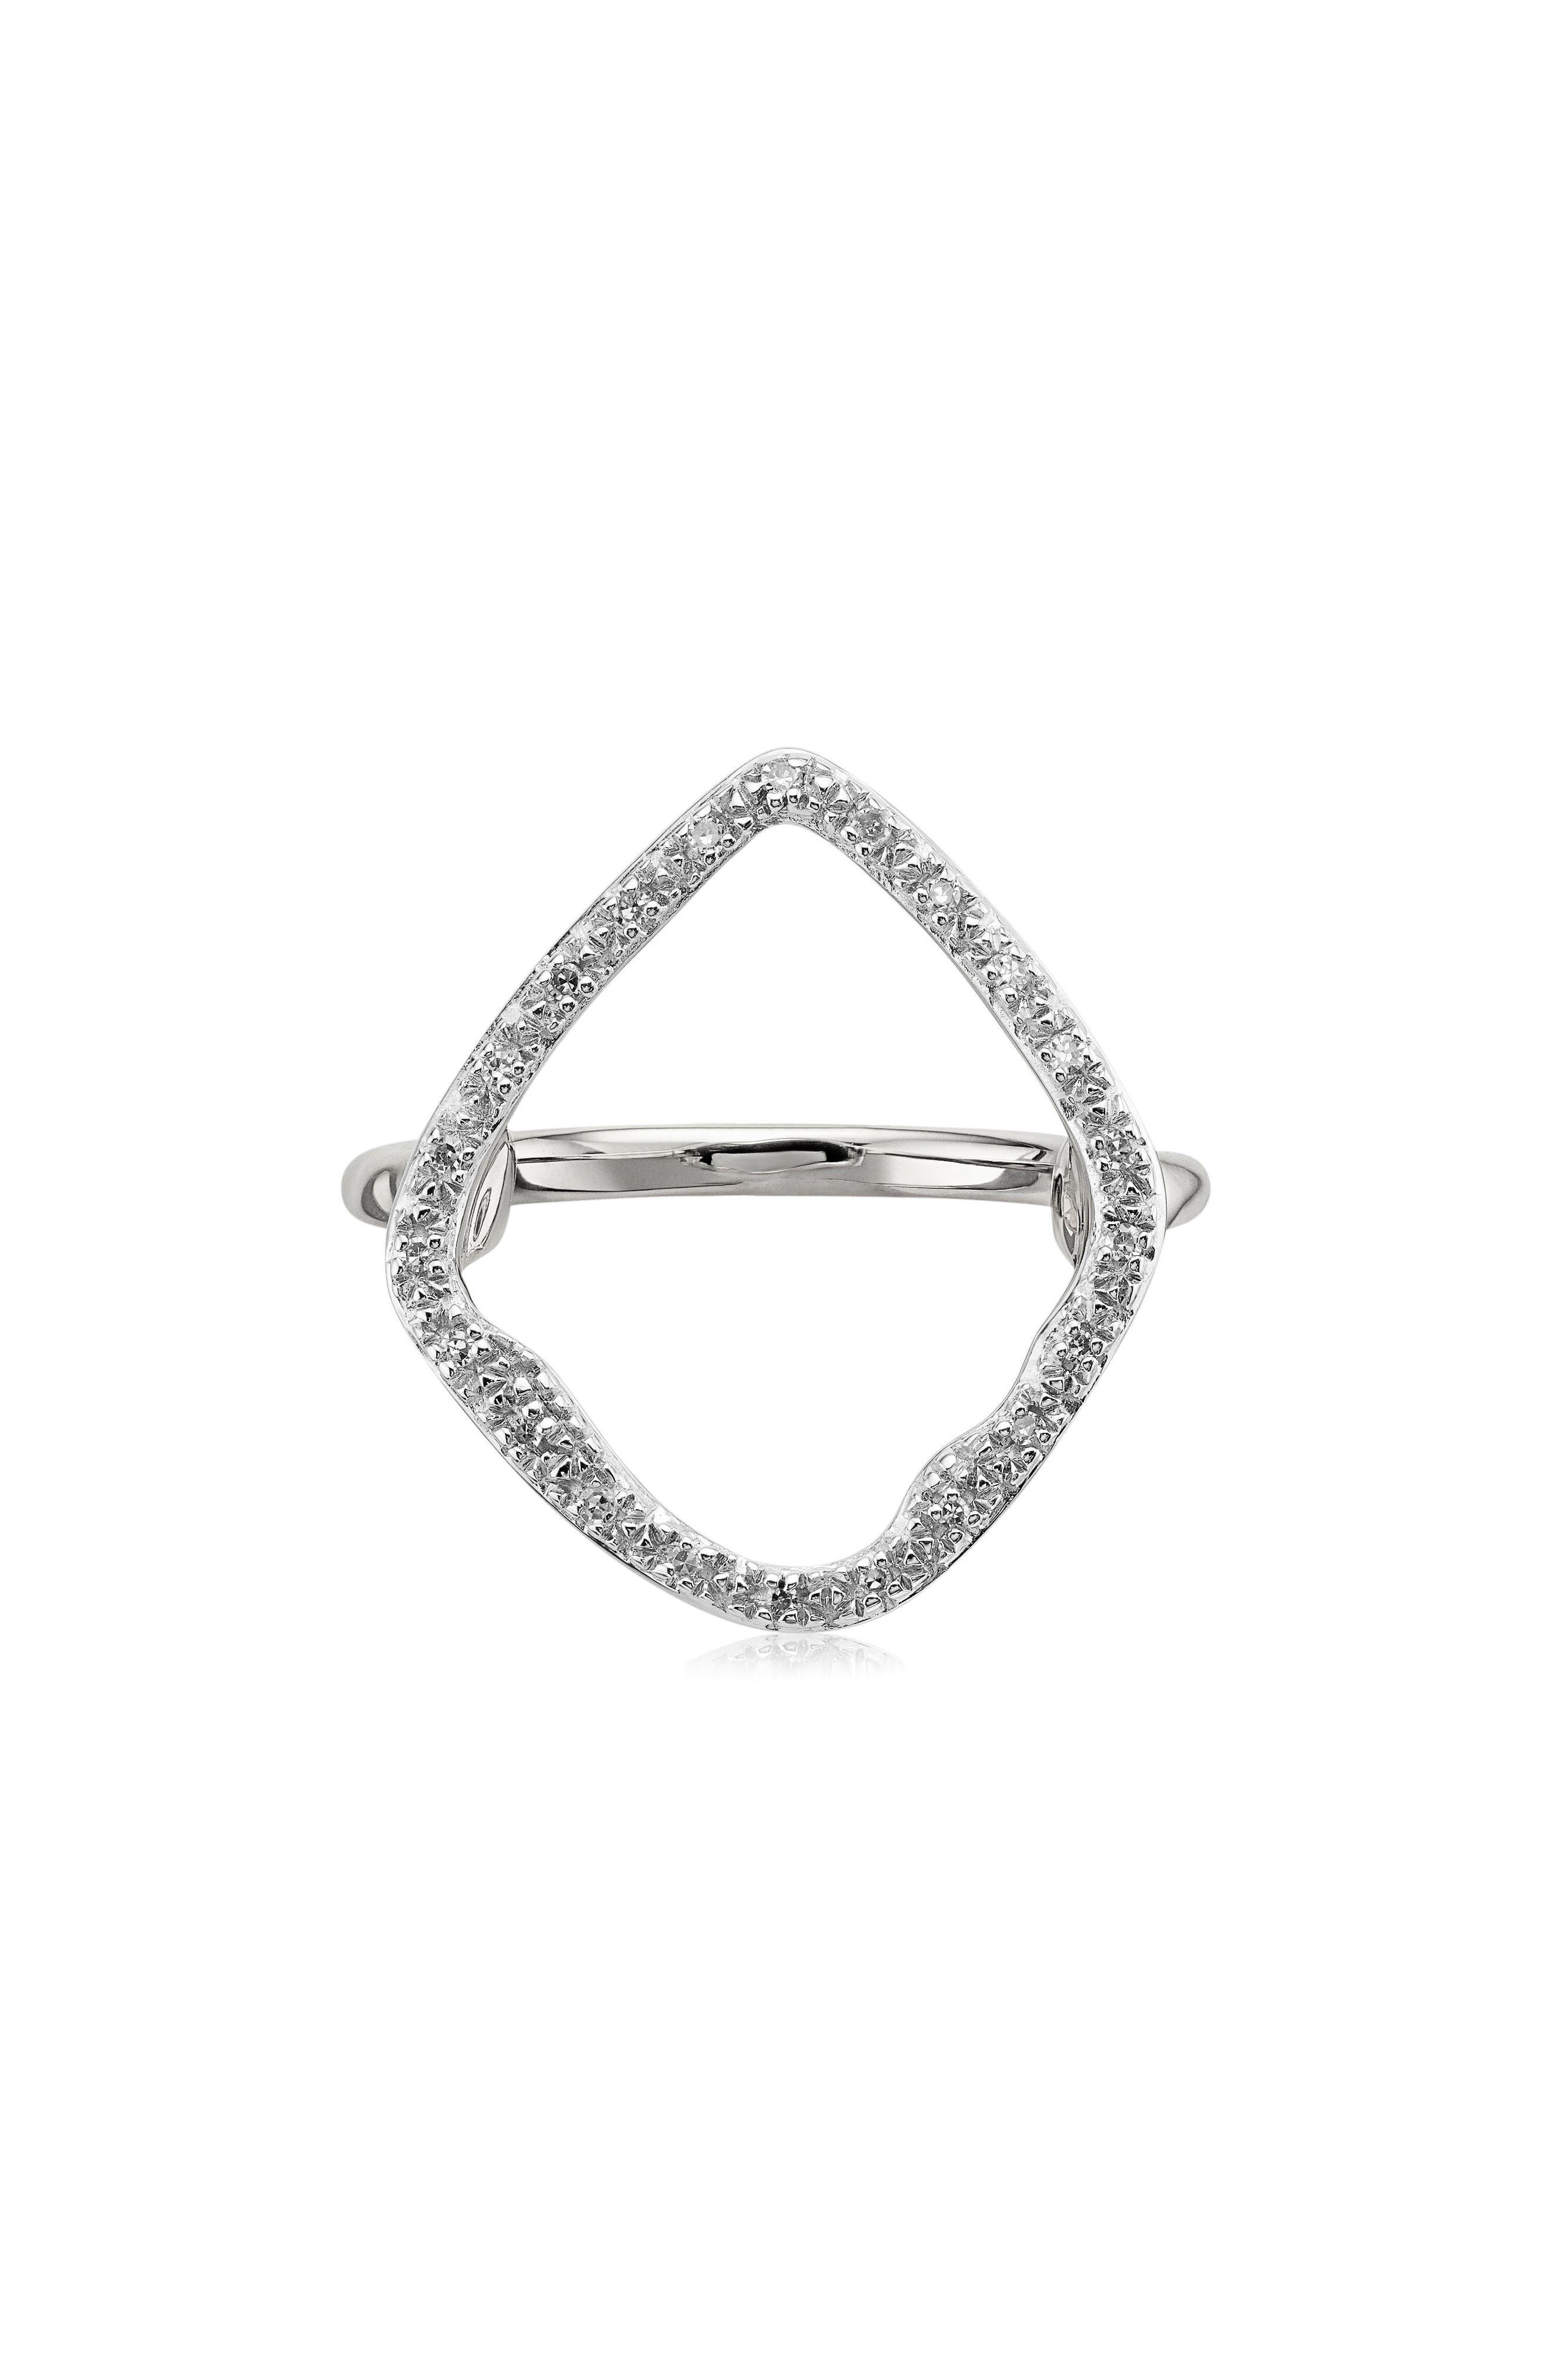 MONICA VINADER Riva Hoop Diamond Ring, Main, color, SILVER